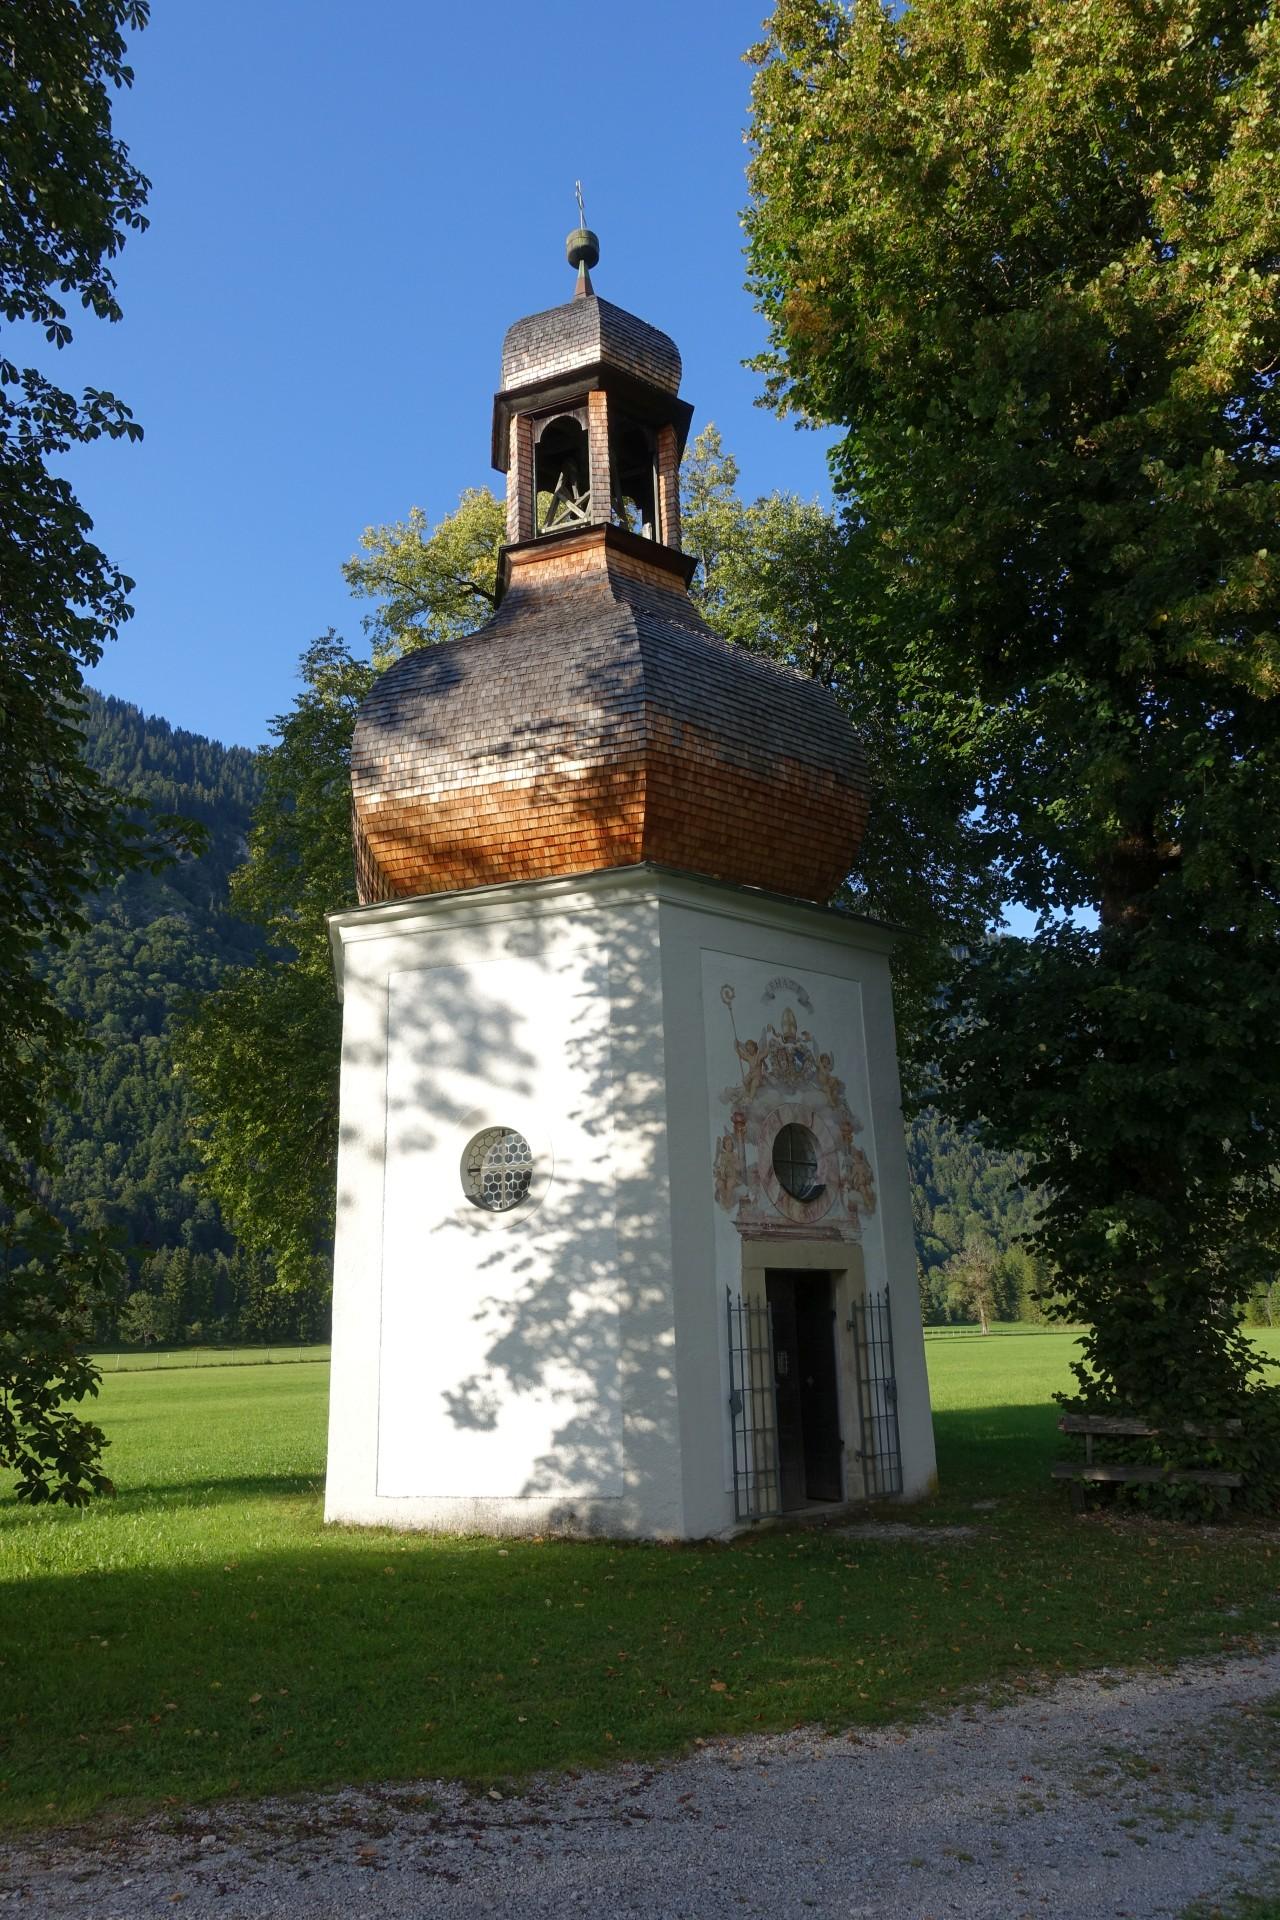 Graswang - Kieneckspitz - Kienjoch - Kuhalmhütte - Graswang